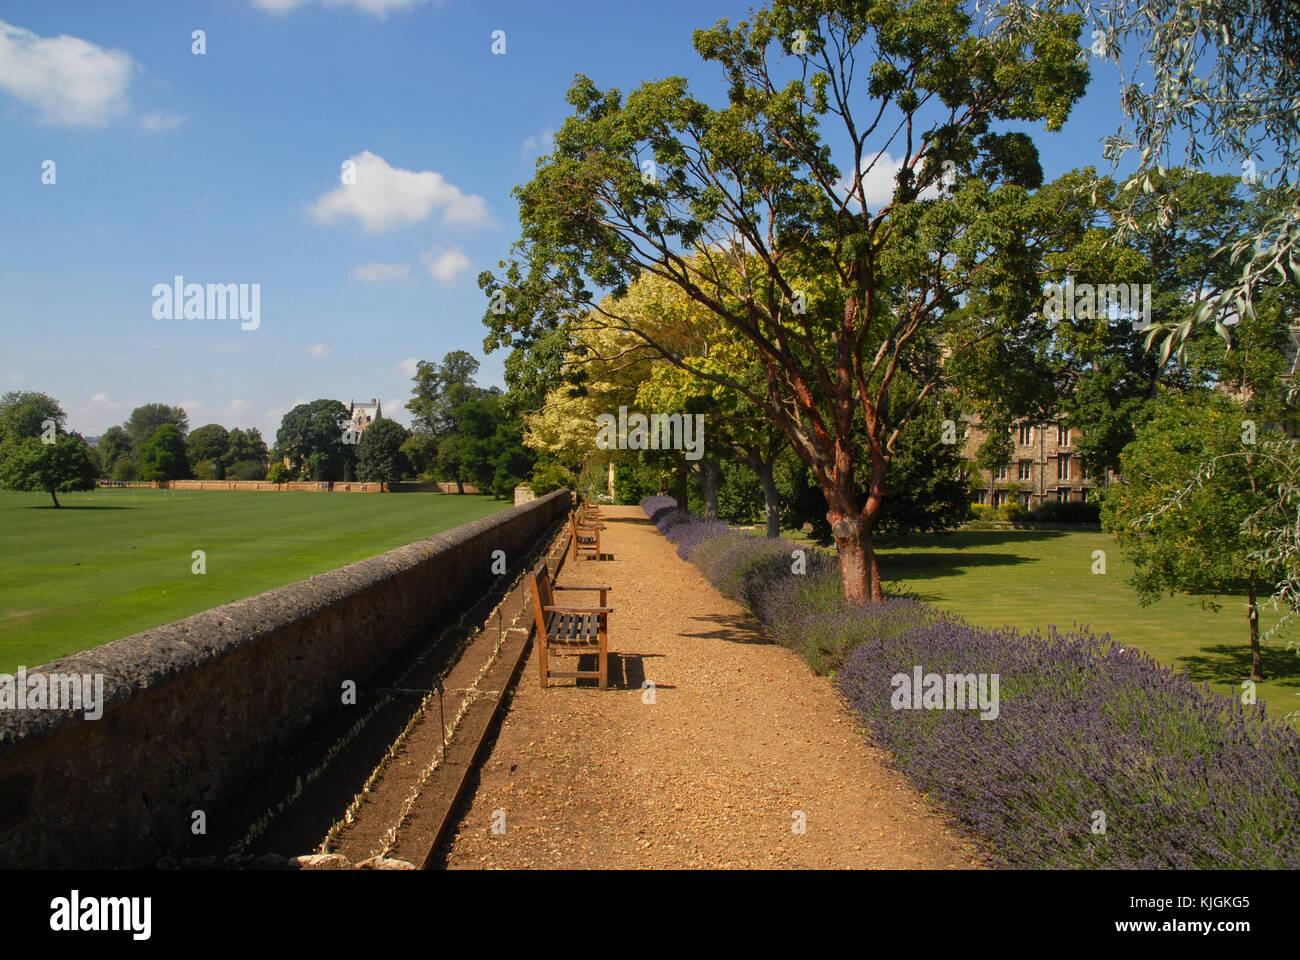 Wall between Fellows Garden of Merton College and Merton Field, Oxford - Stock Image